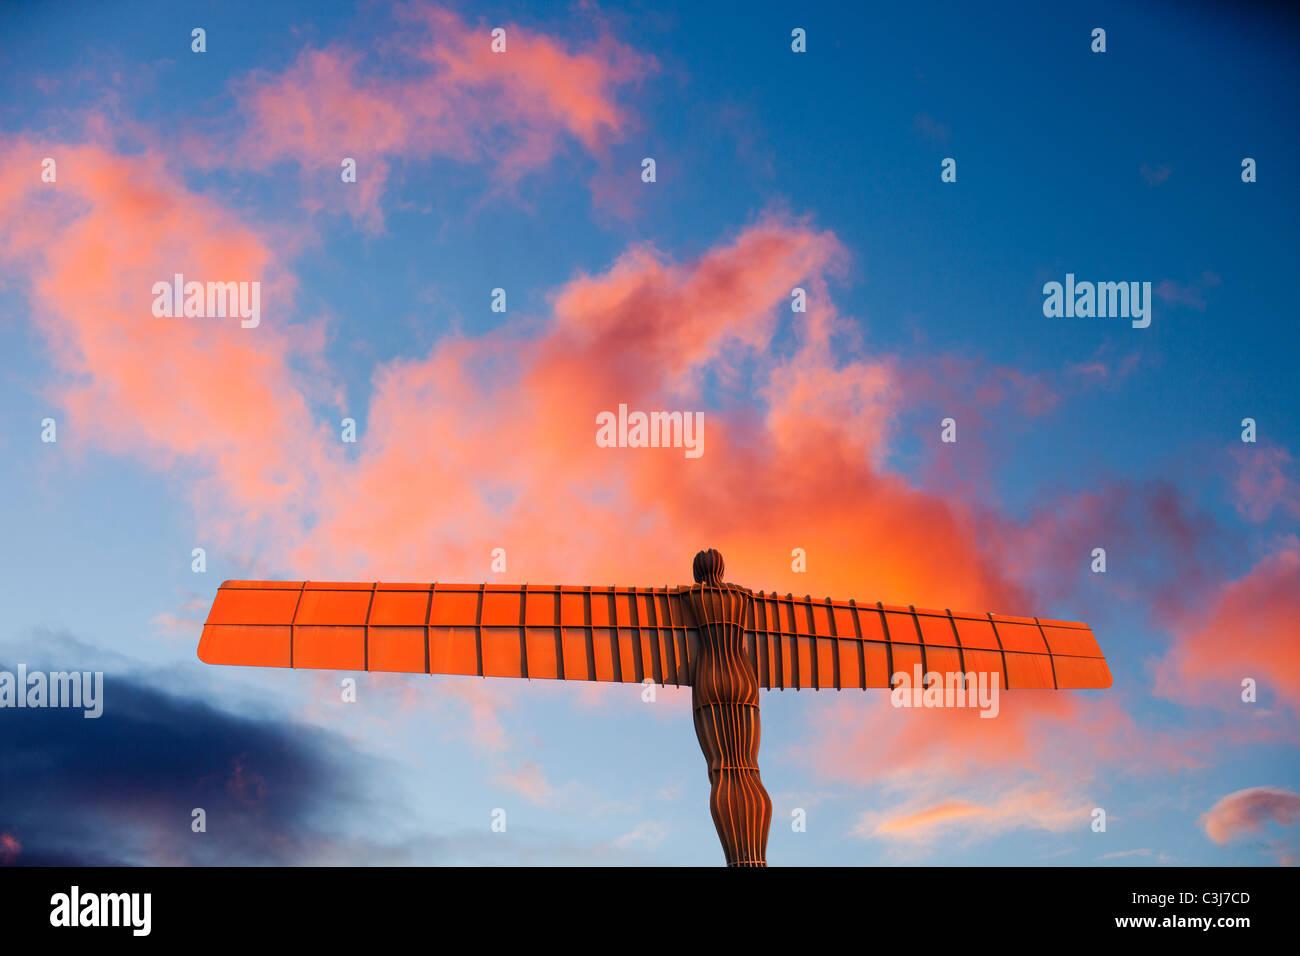 L'Ange du Nord au coucher du soleil, Gateshead, Royaume-Uni. Photo Stock